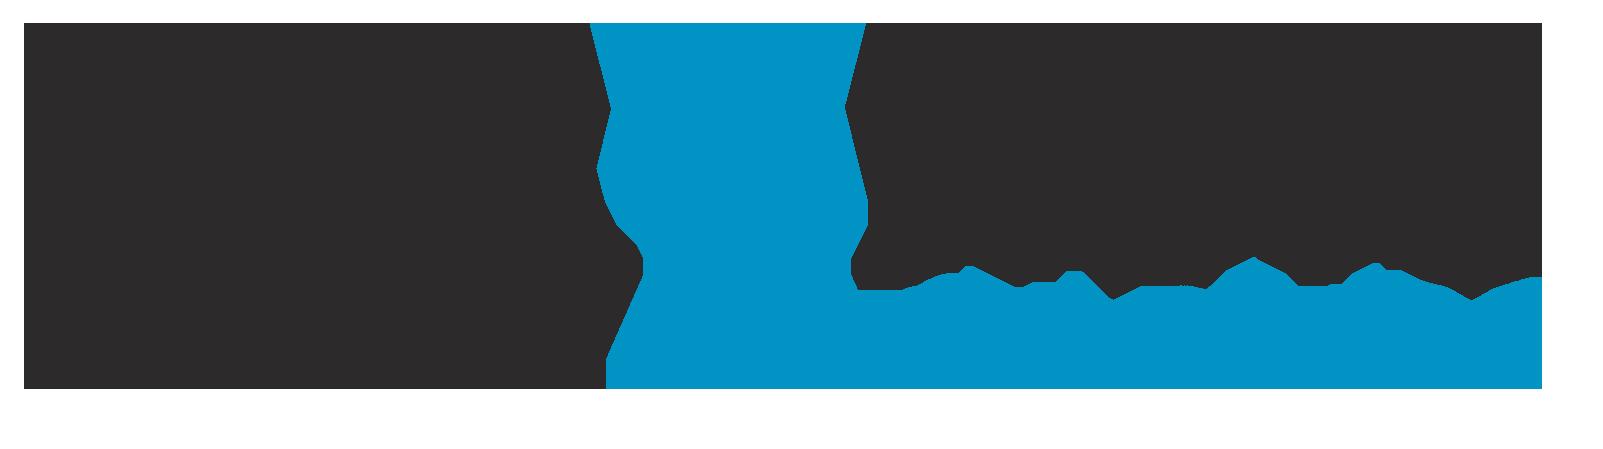 Icelandic startups